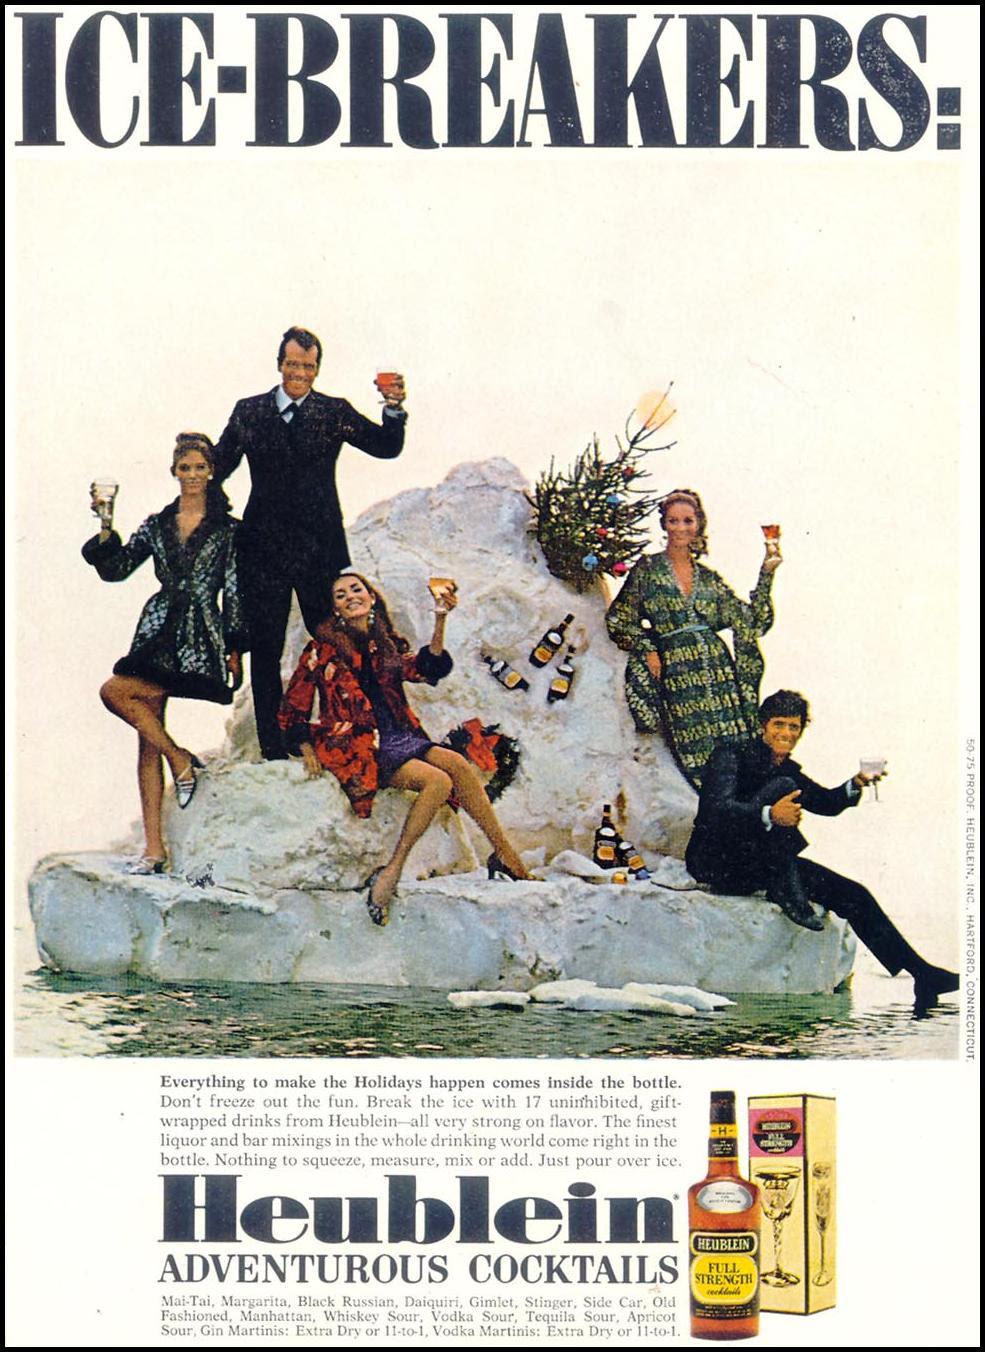 HEUBLEIN ADVENTUROUS COCKTAILS SATURDAY EVENING POST 12/28/1968 p. 13